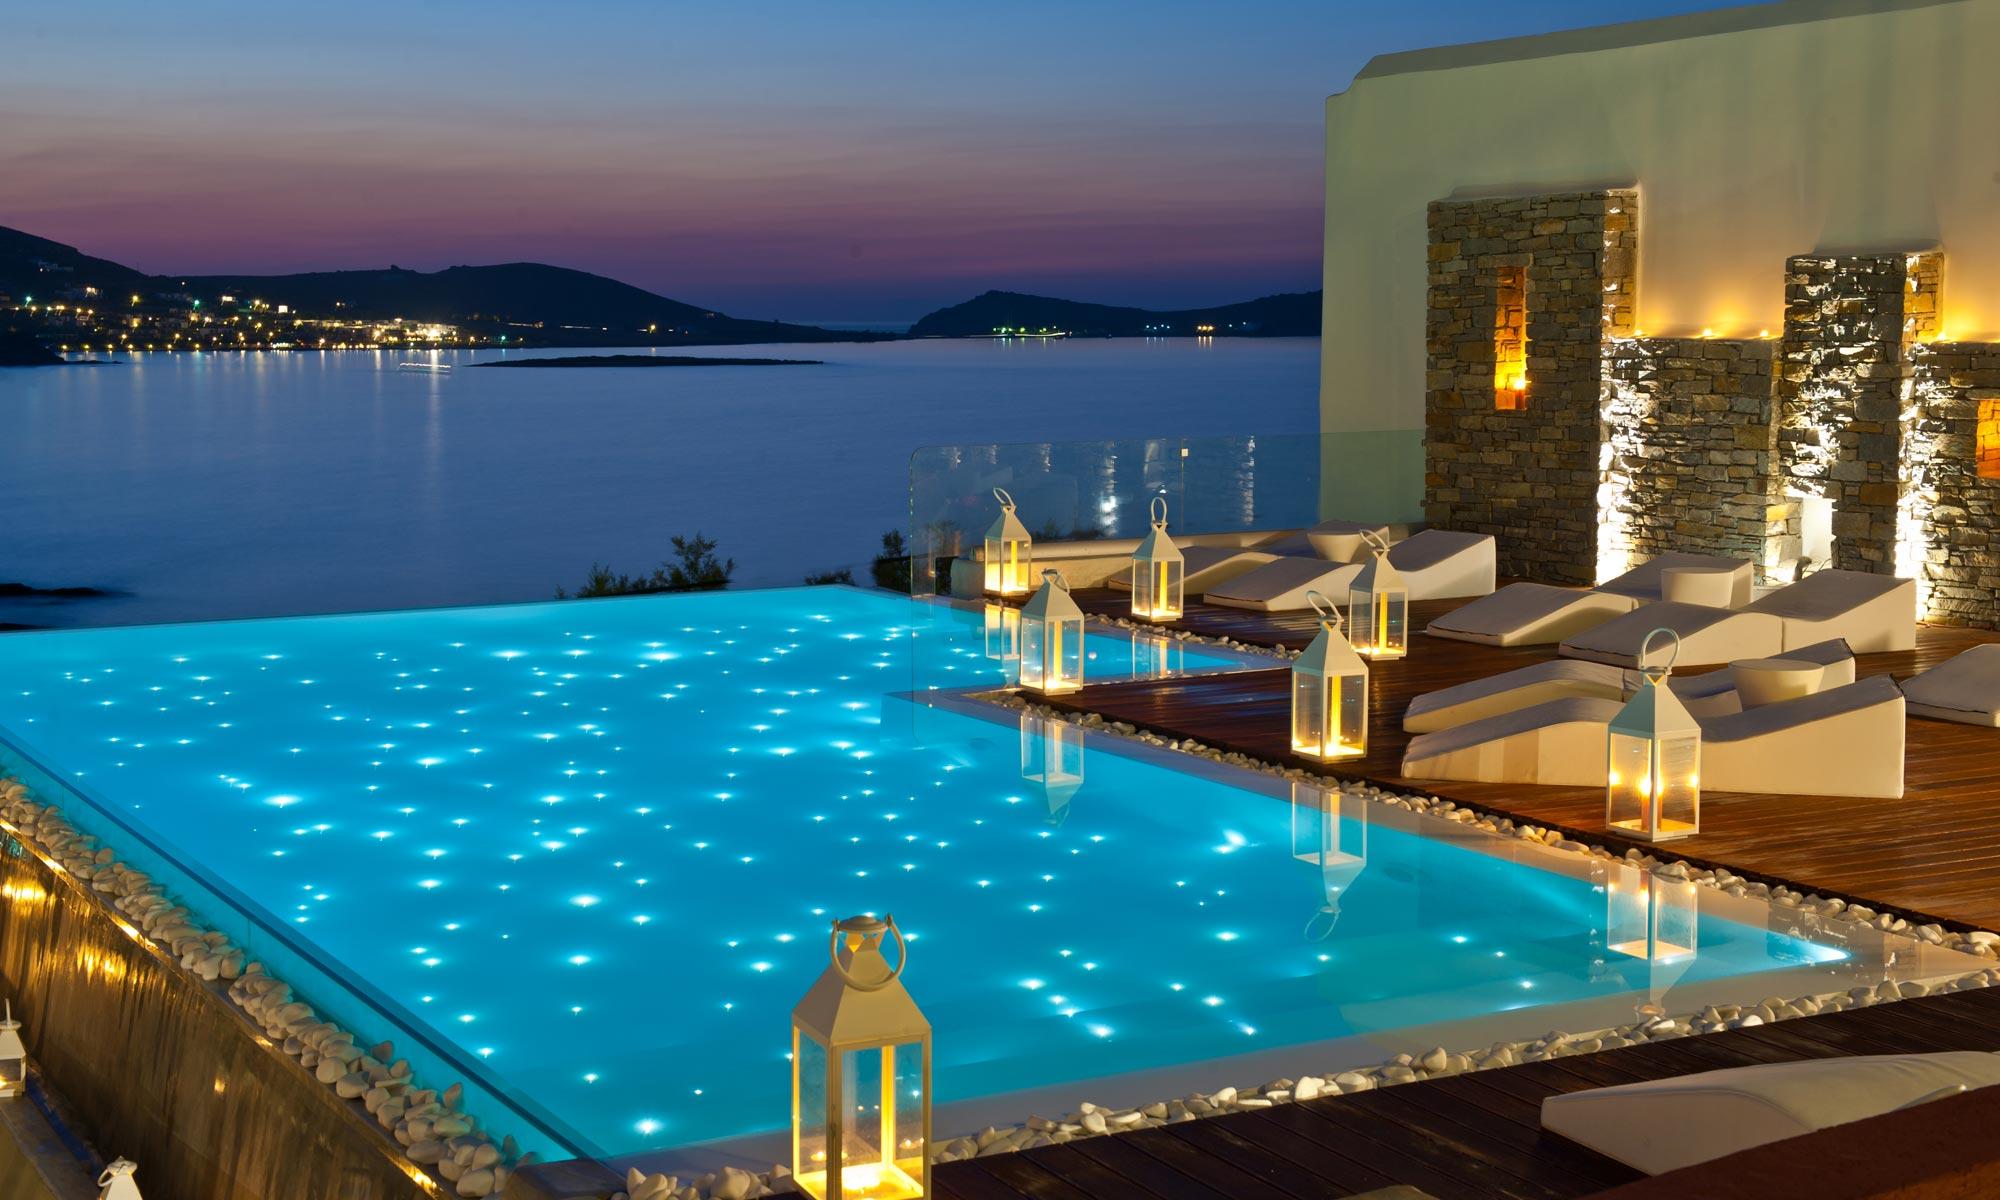 Elegir iluminaci n de fibra ptica para piscina for Piletas modernas